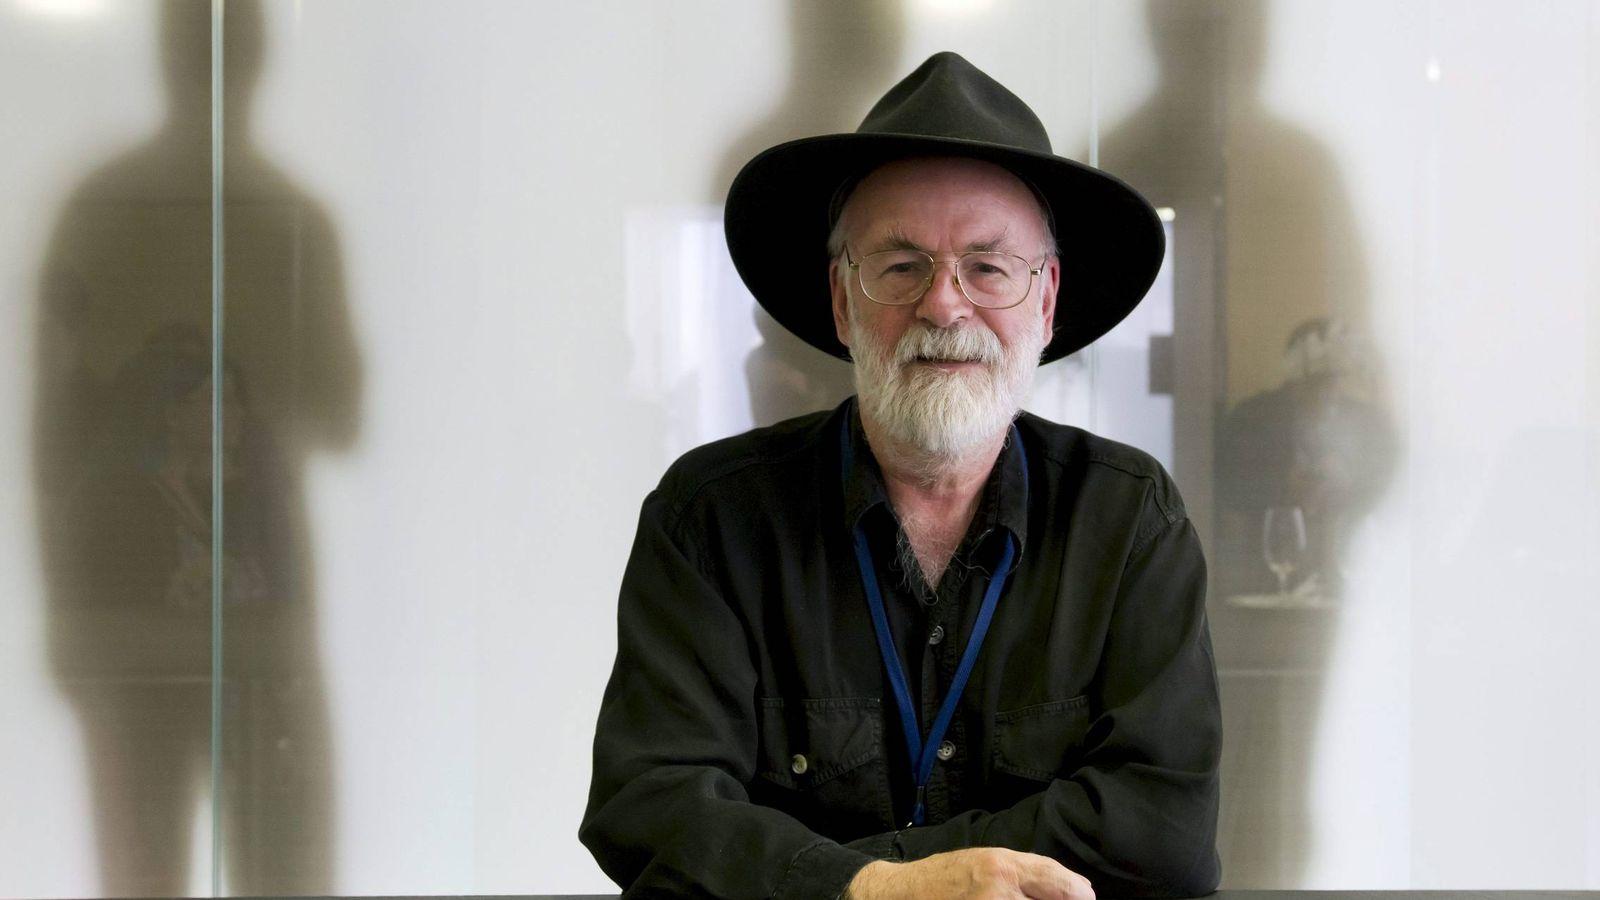 Foto: Muere el escritor británico Terry Pratchett tras una larga lucha contra el alzheimer (EFE)